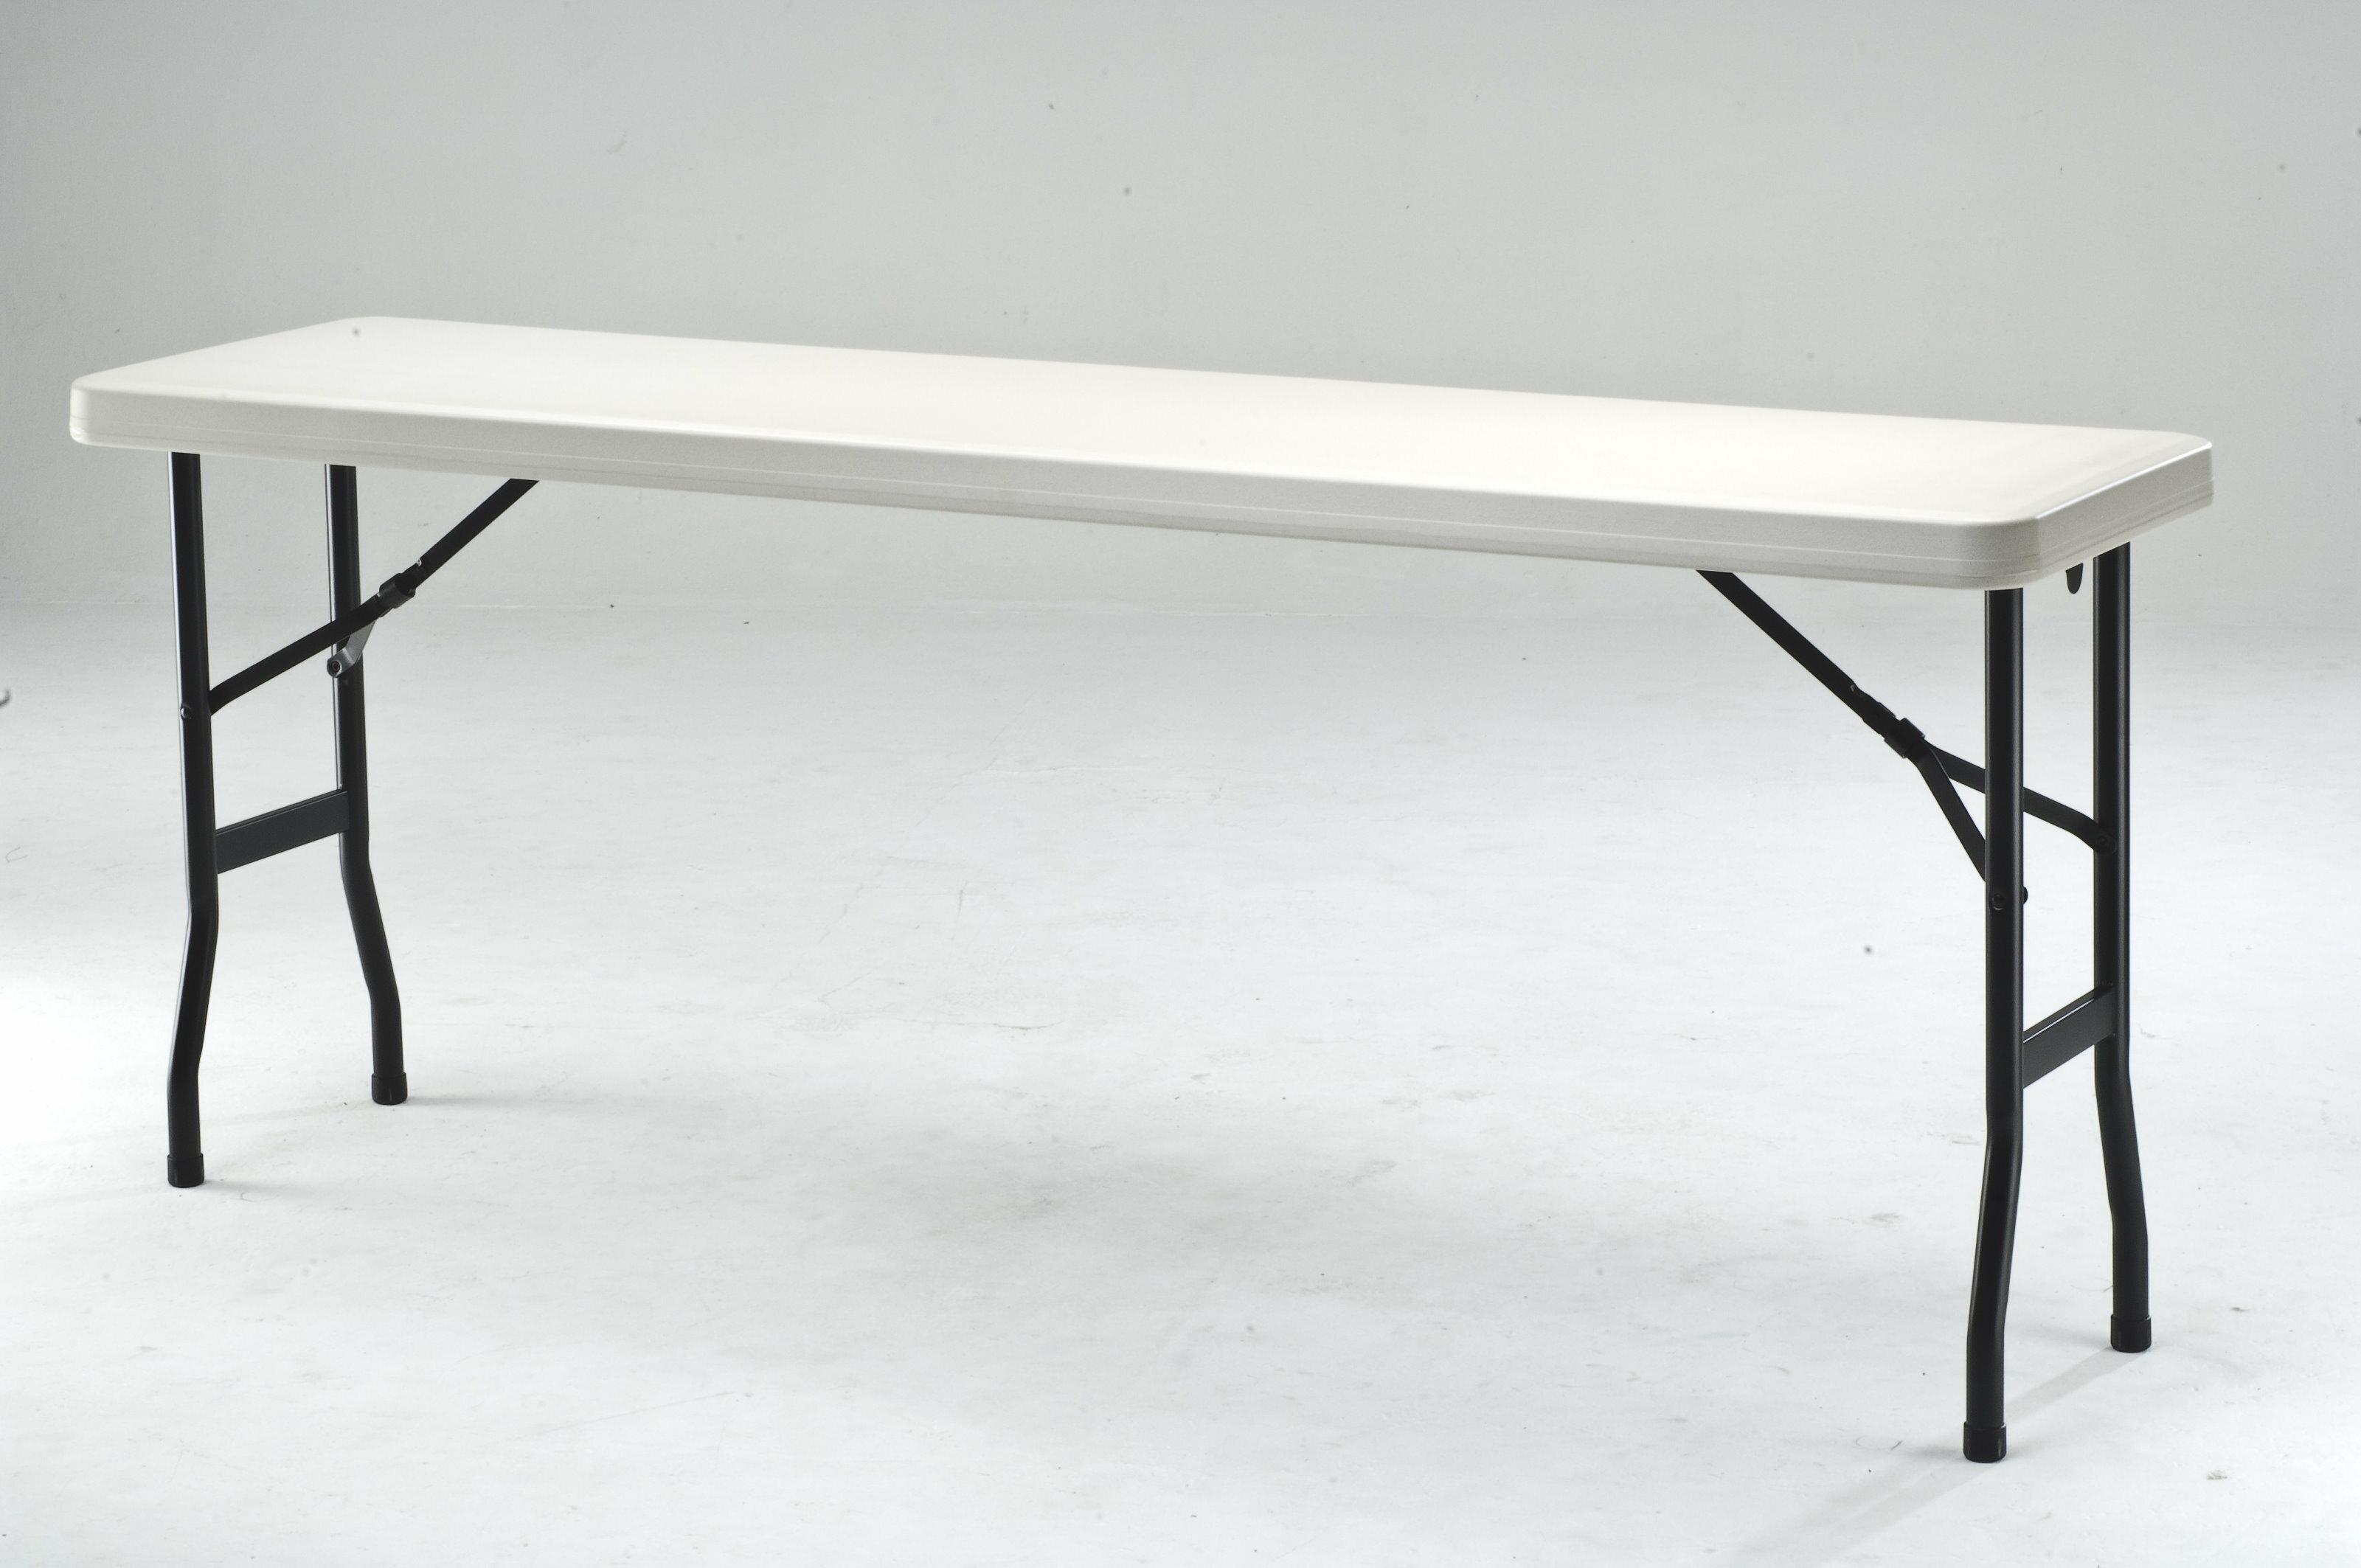 【MK1860】152X45公分超實用環保折疊收納桌/補習班/辦公室工作桌/教學用桌/佛堂用桌/展覽桌/戶外活動桌★★♪♪外銷優質收納桌♪♪